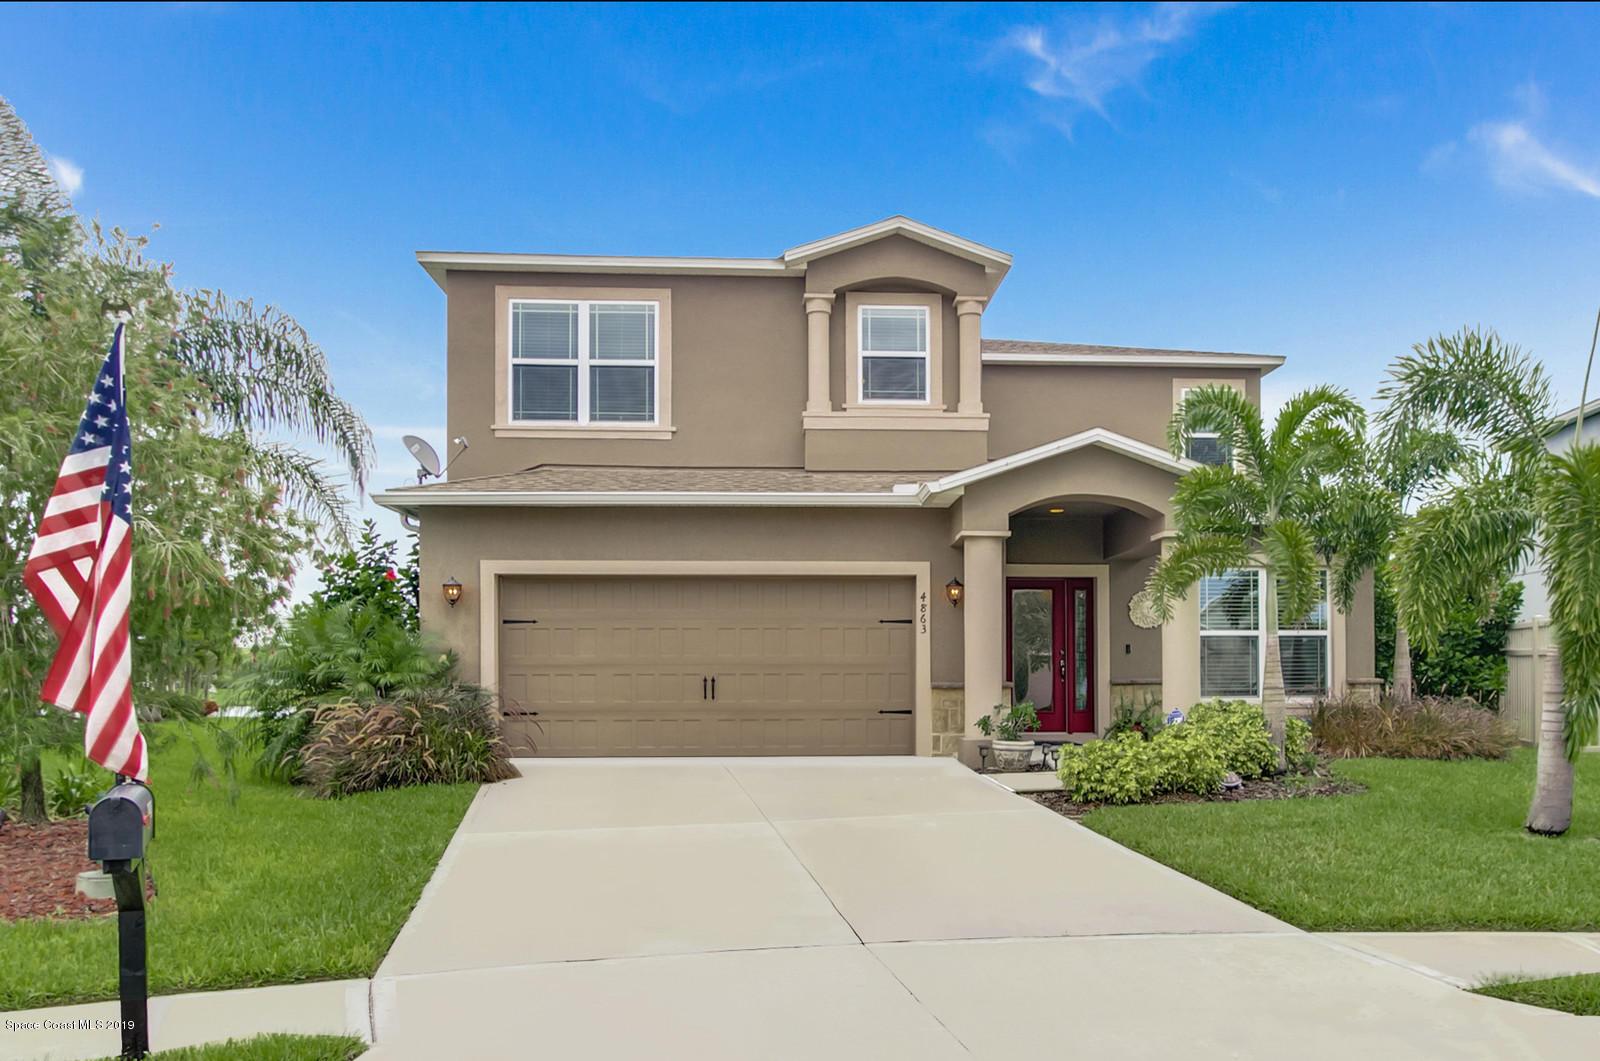 Single Family Homes for Sale at 4863 Borealis Melbourne, Florida 32940 United States